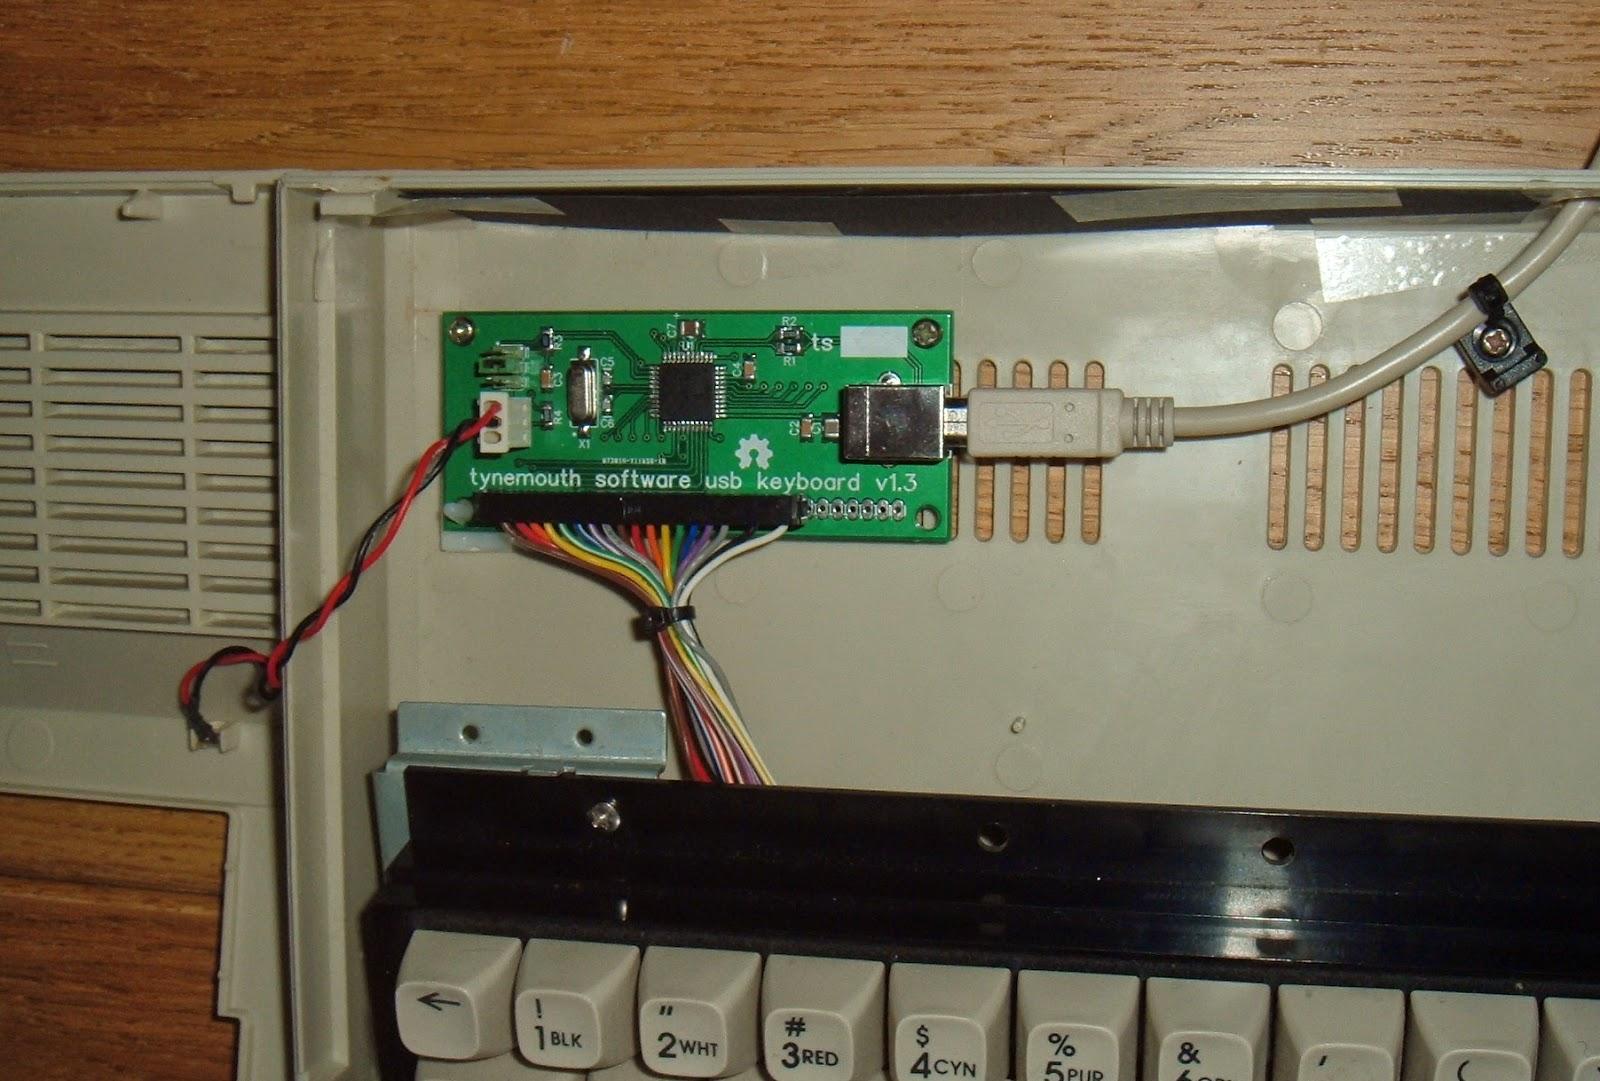 USB-CAN интерфейс, или просто CAN хакер своими руками 97